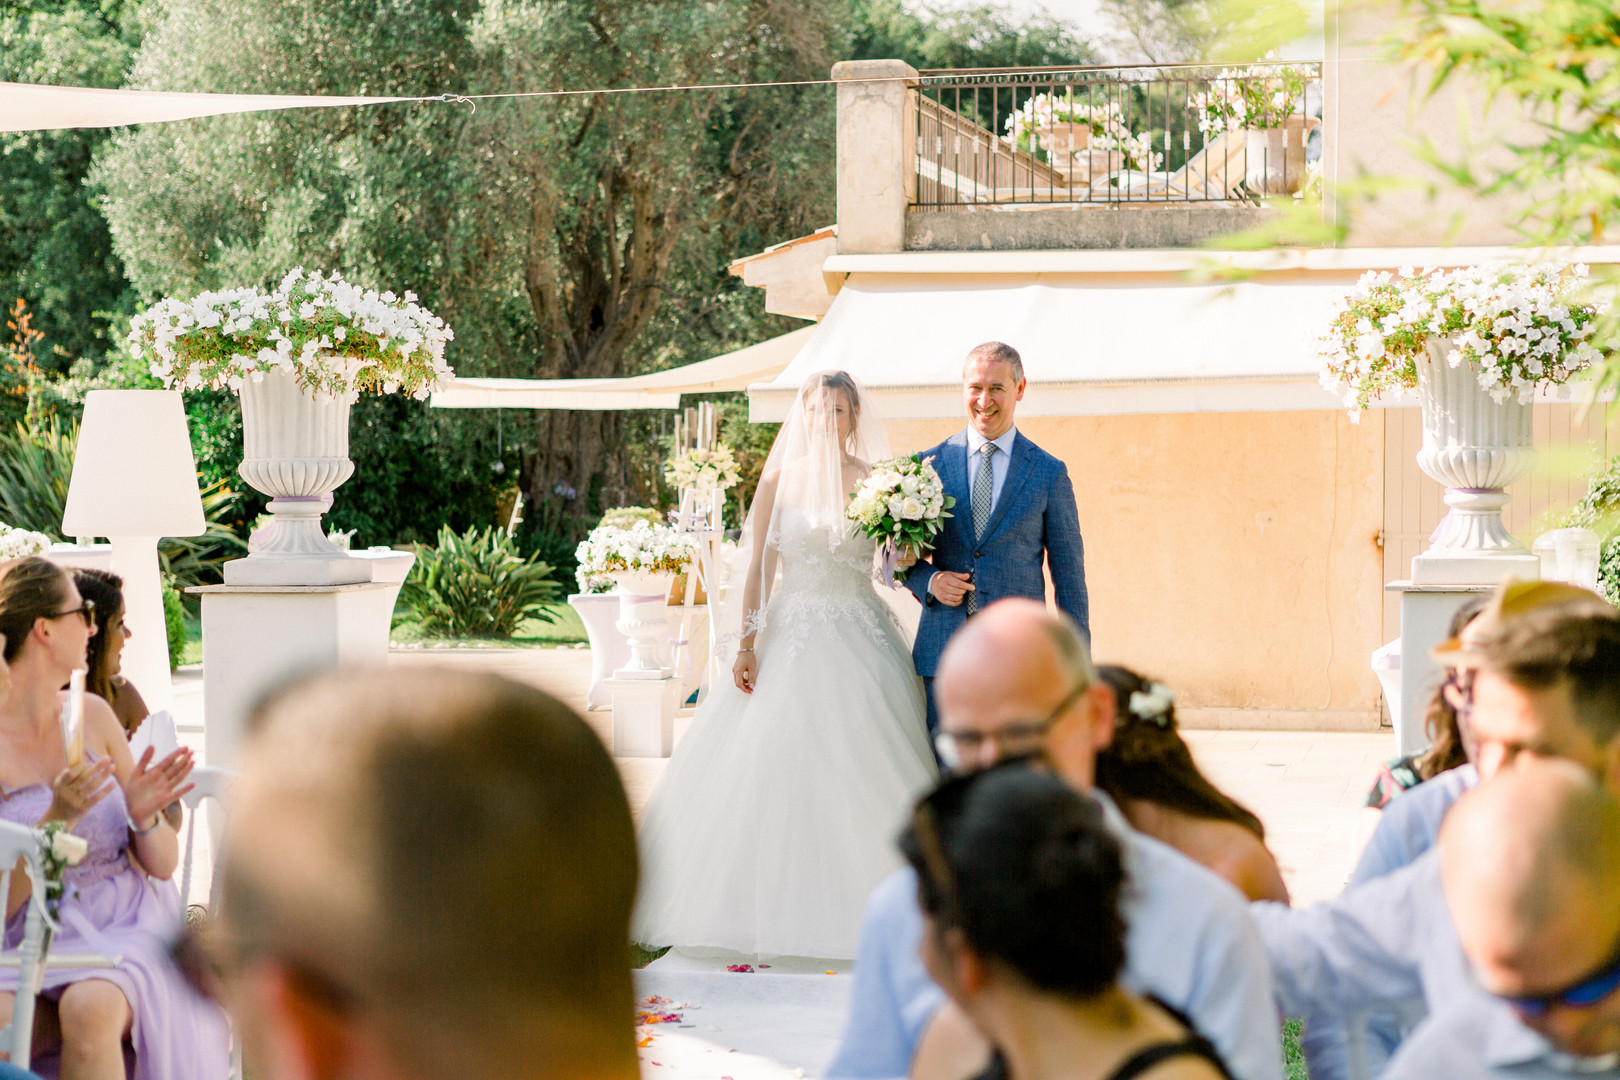 cérémonie laïque, Sandra Malbequi, Photographe mariage, Nice, Alpes Maritimes, Var, Monaco, France, Sandramalbequiphotography.com